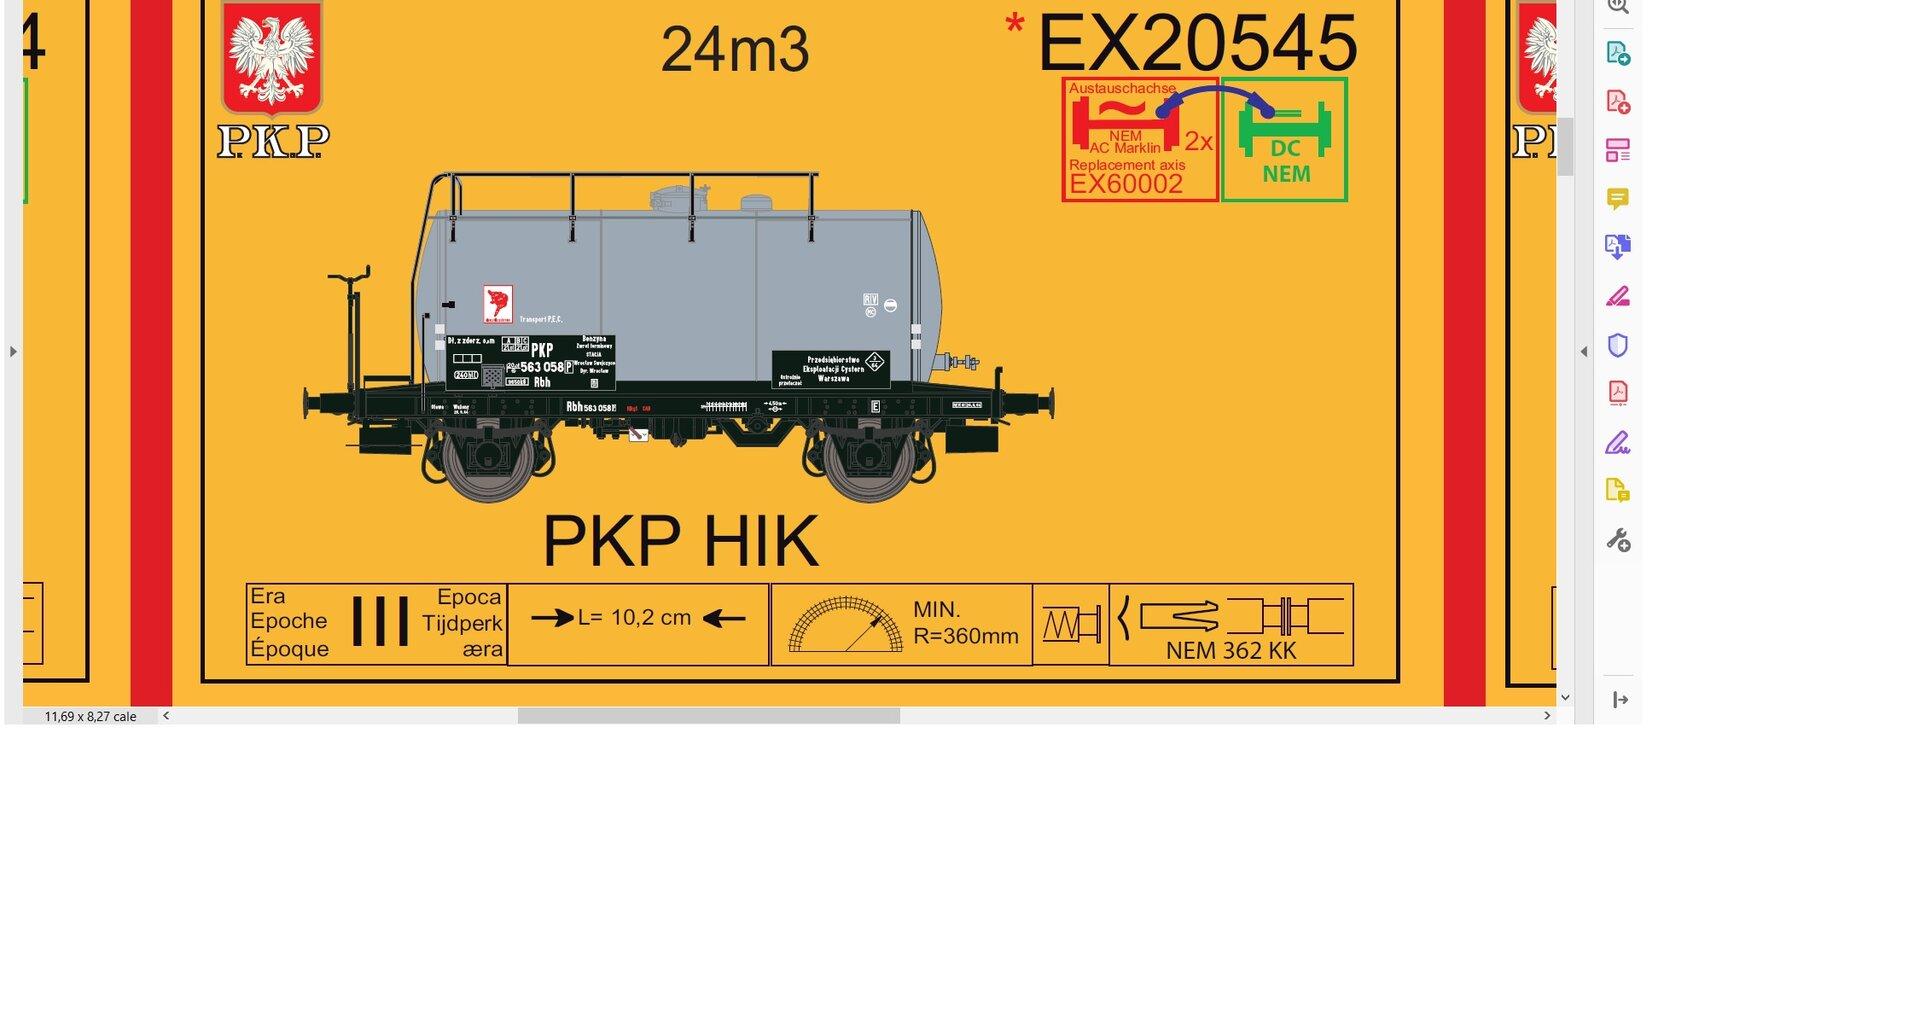 EX20545.jpg